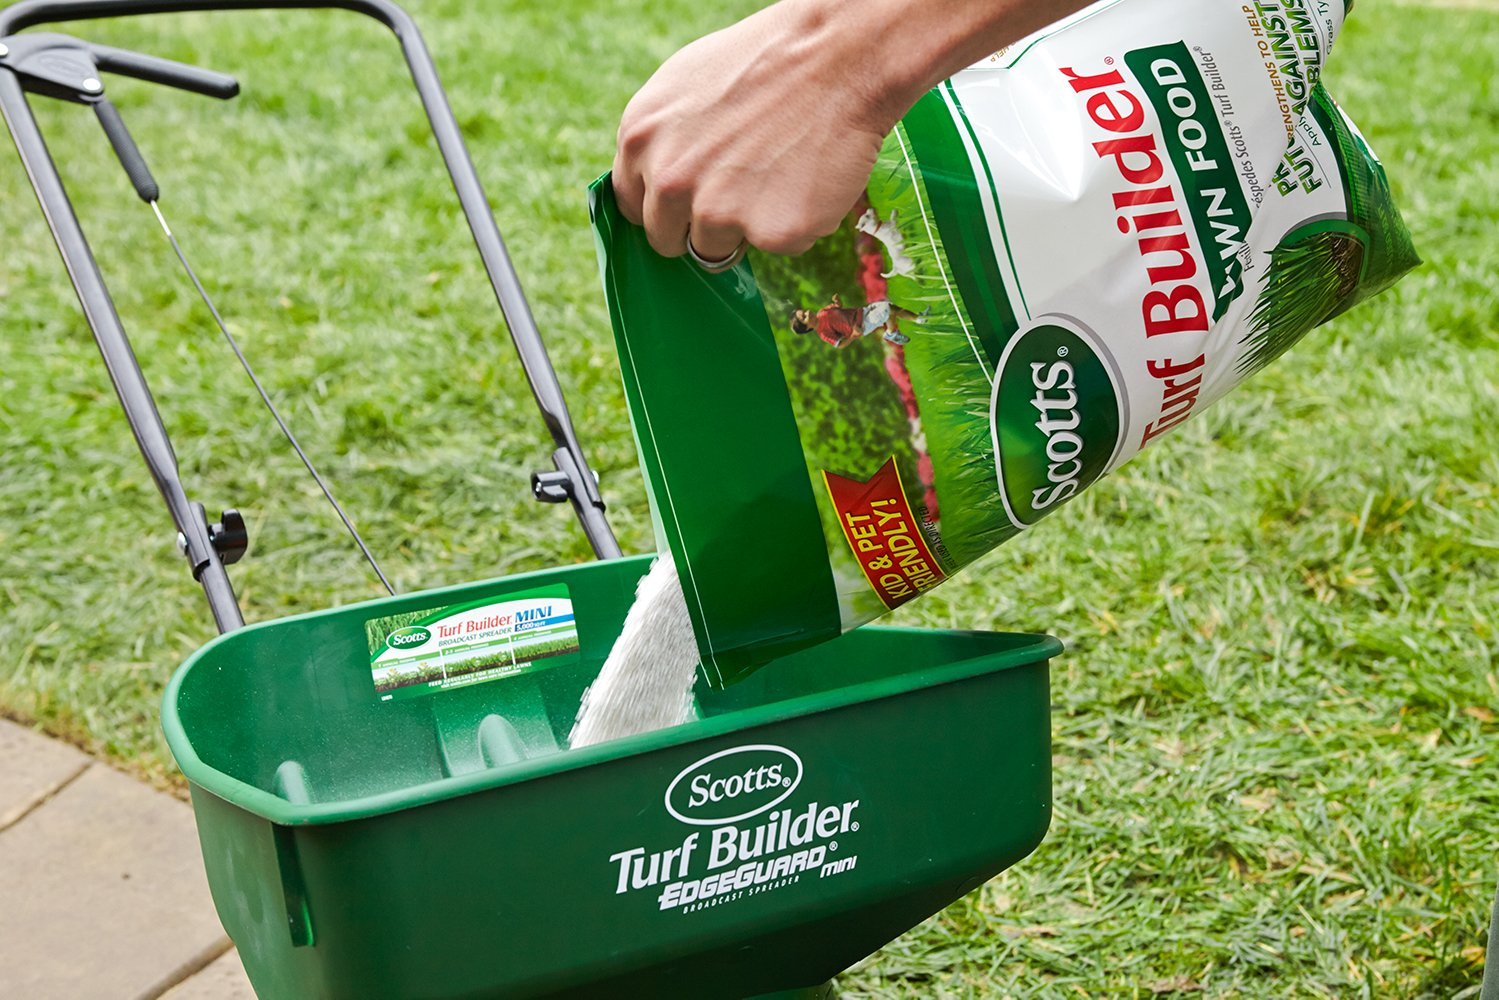 Scotts Turf Builder 500 sq Fertilizer Image 3